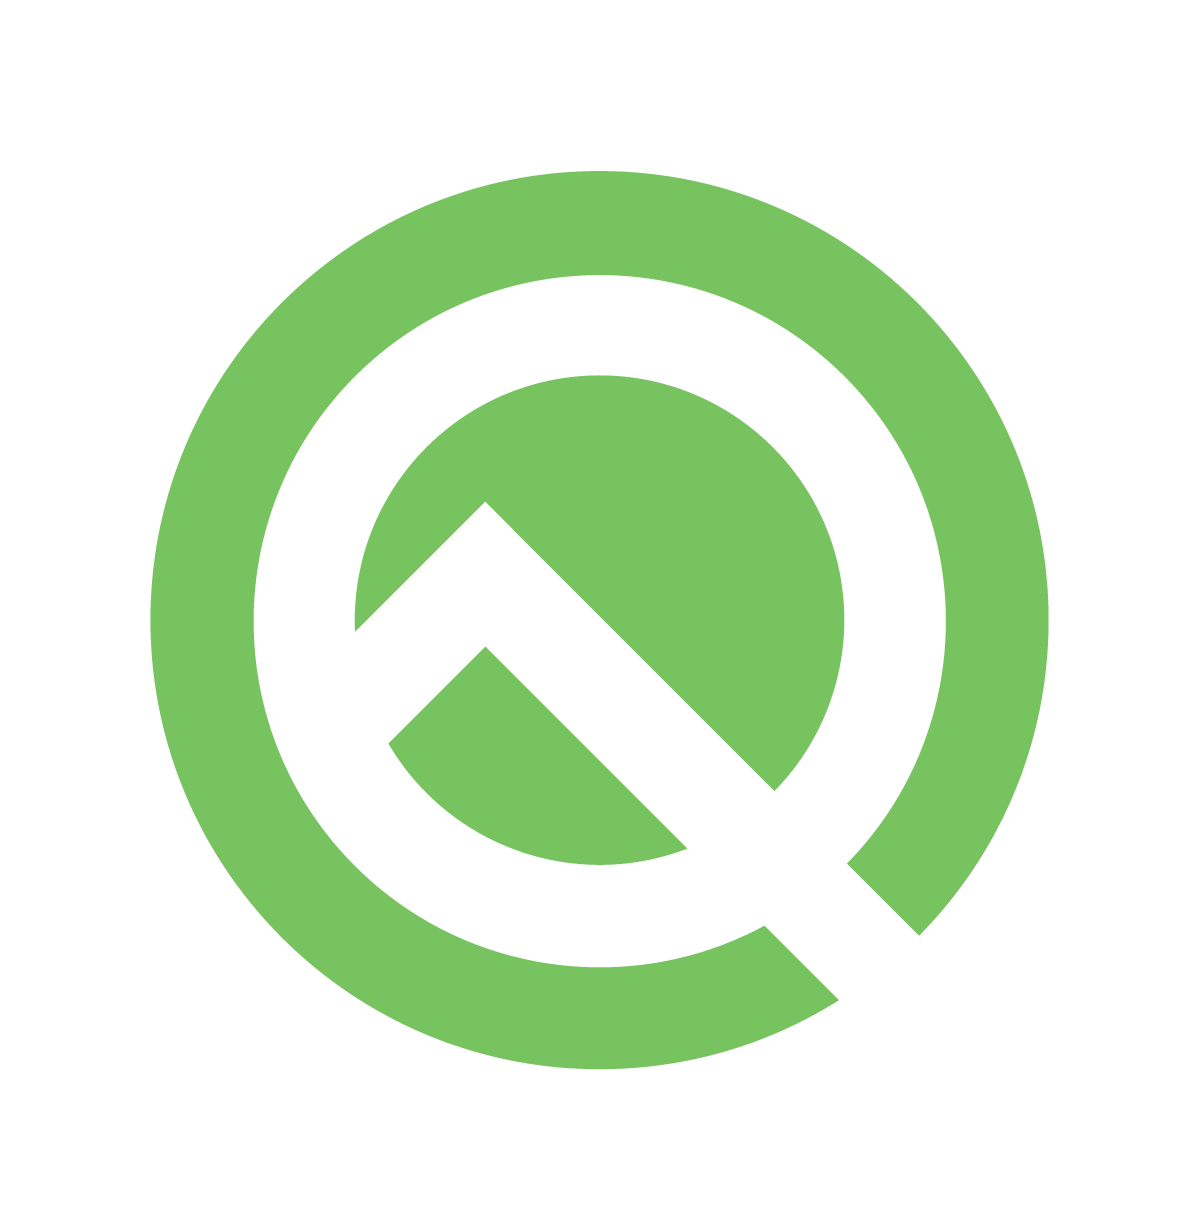 Android Q ベータ版のロゴ